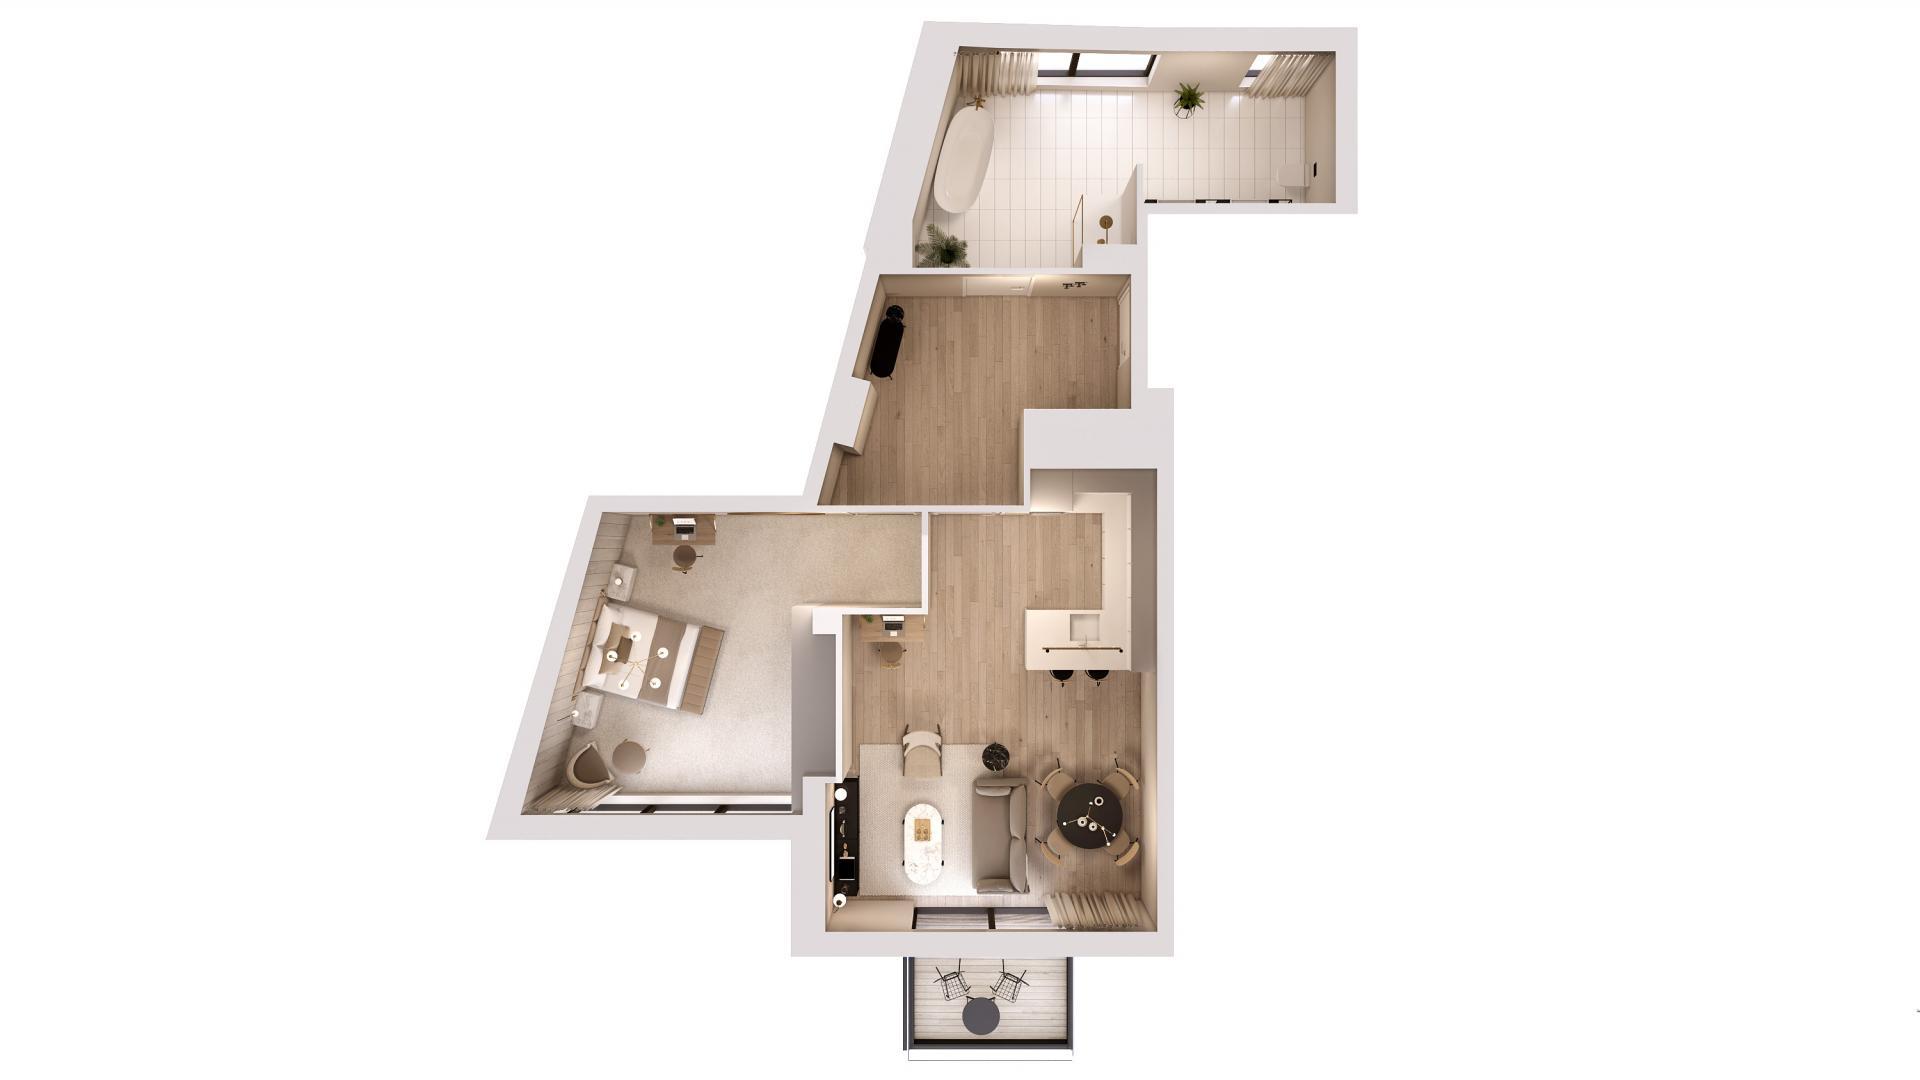 1 bed premium floor plan at STAY Camden Serviced Apartments, Camden, London